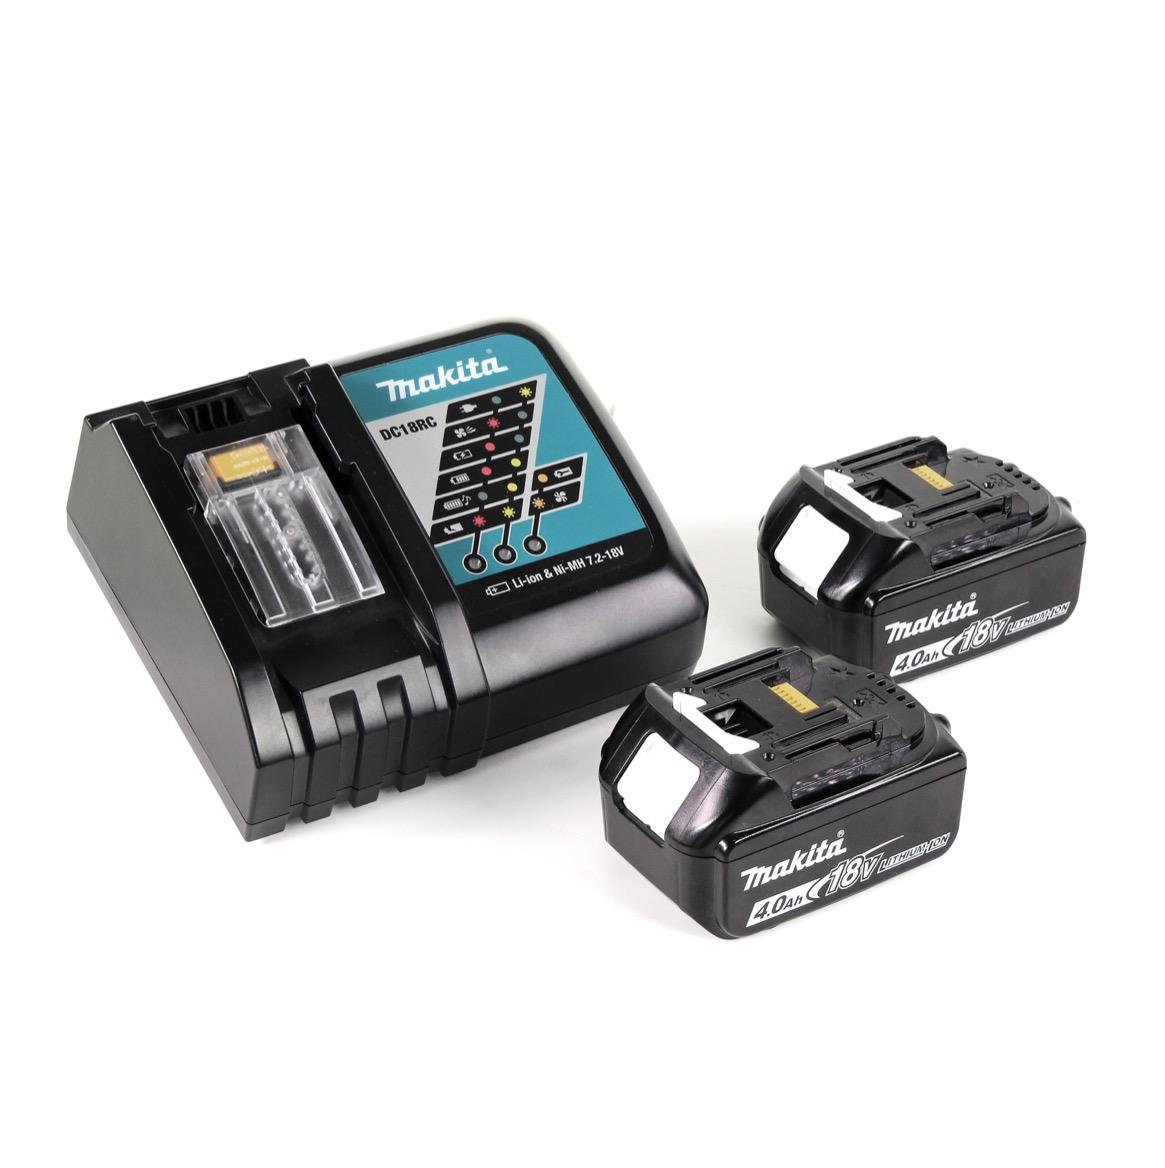 Makita DGA504RMJ Akku-Winkelschleifer 18V Brushless 125mm 125mm + 2x Akku 4,0Ah + Ladegerät + Koffer_ab__is.image_number.default